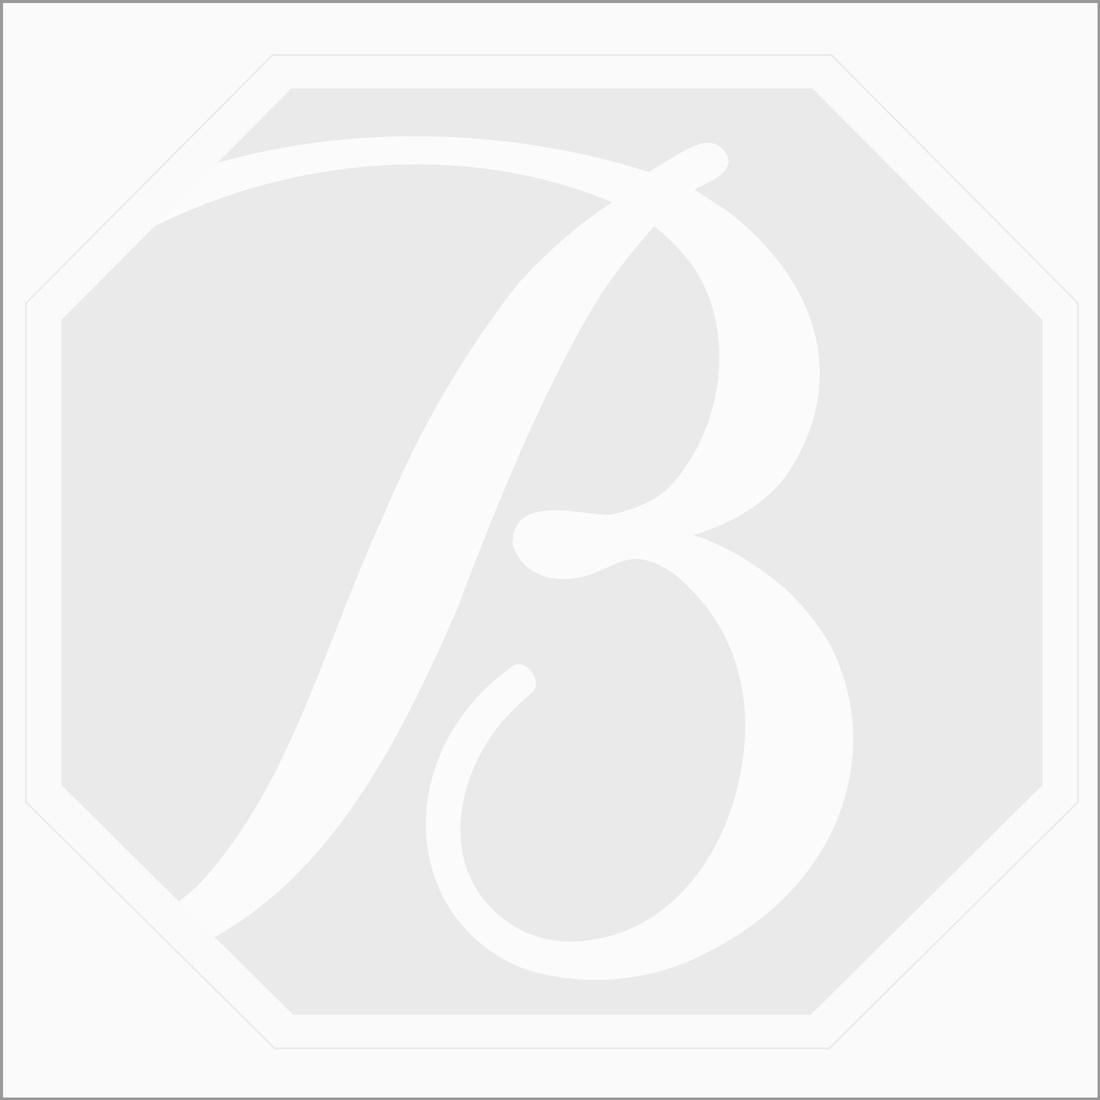 6.50 x 5 mm - Dark Gray Rose Cut Diamond Rectangle Shape - 1.93 carats (FncyDiaRC1082)